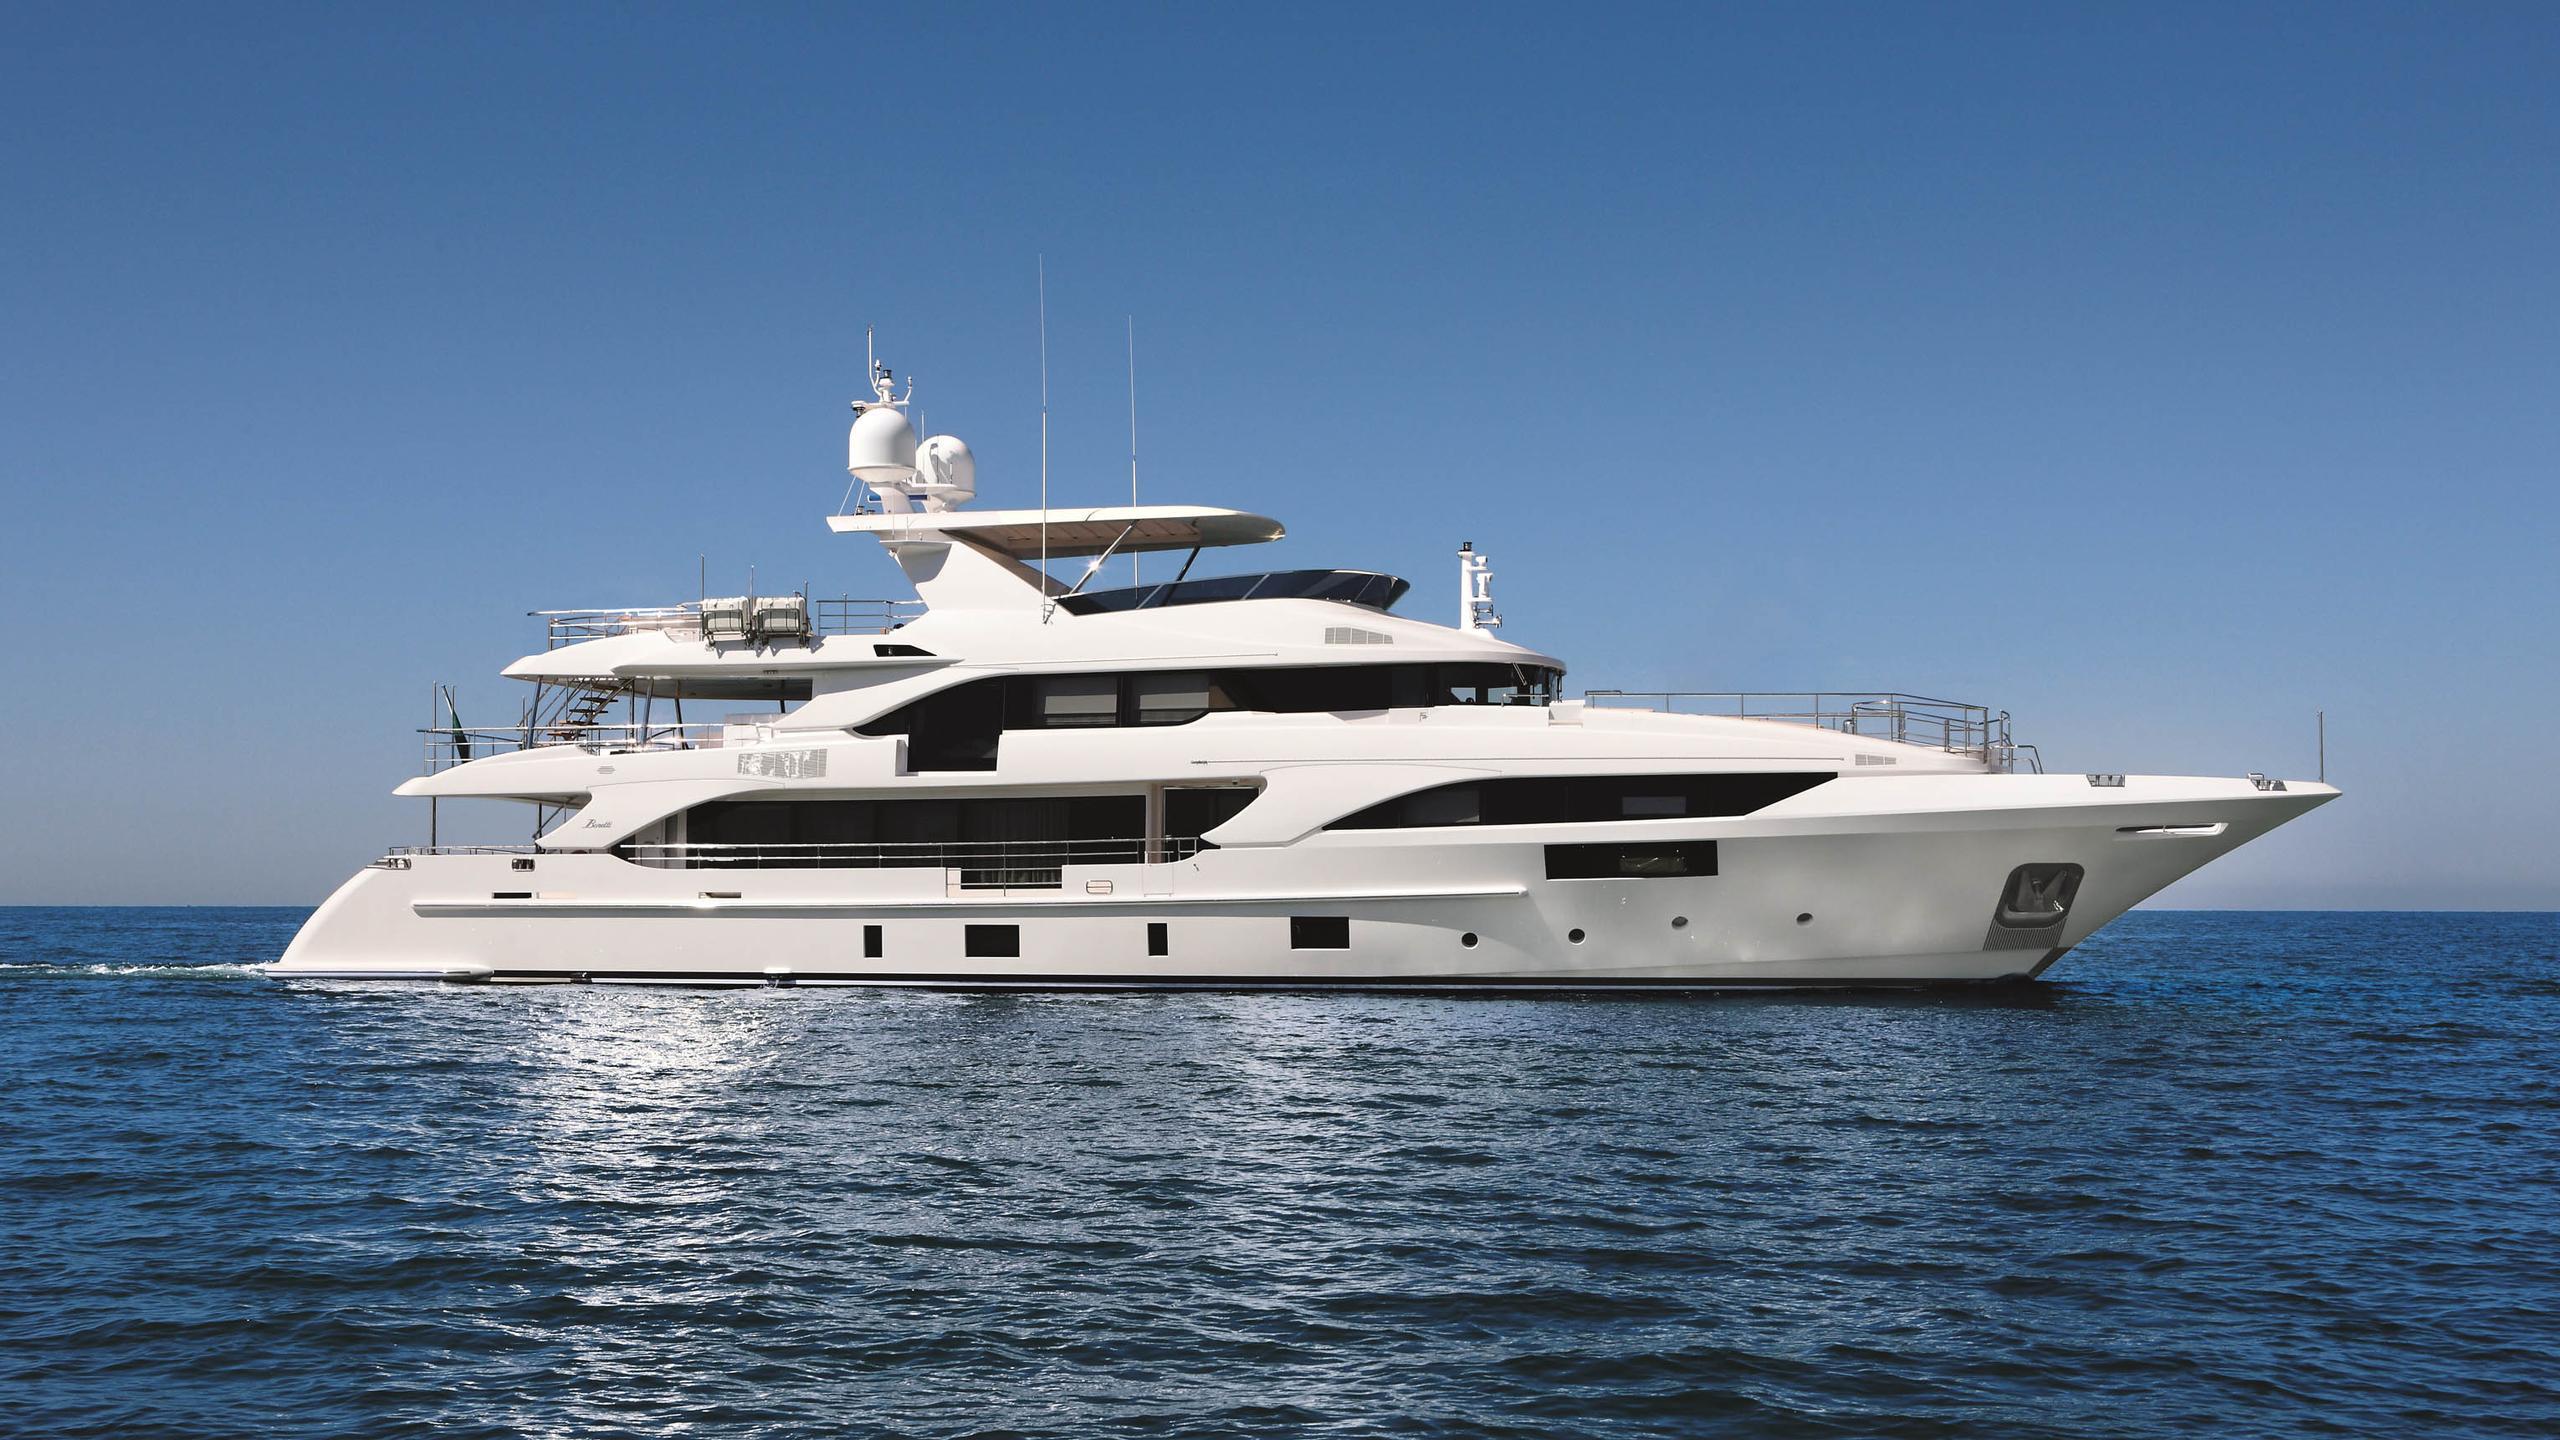 supreme 132 bs011 motoryacht benetti yachts 40m 2019 profile sistership